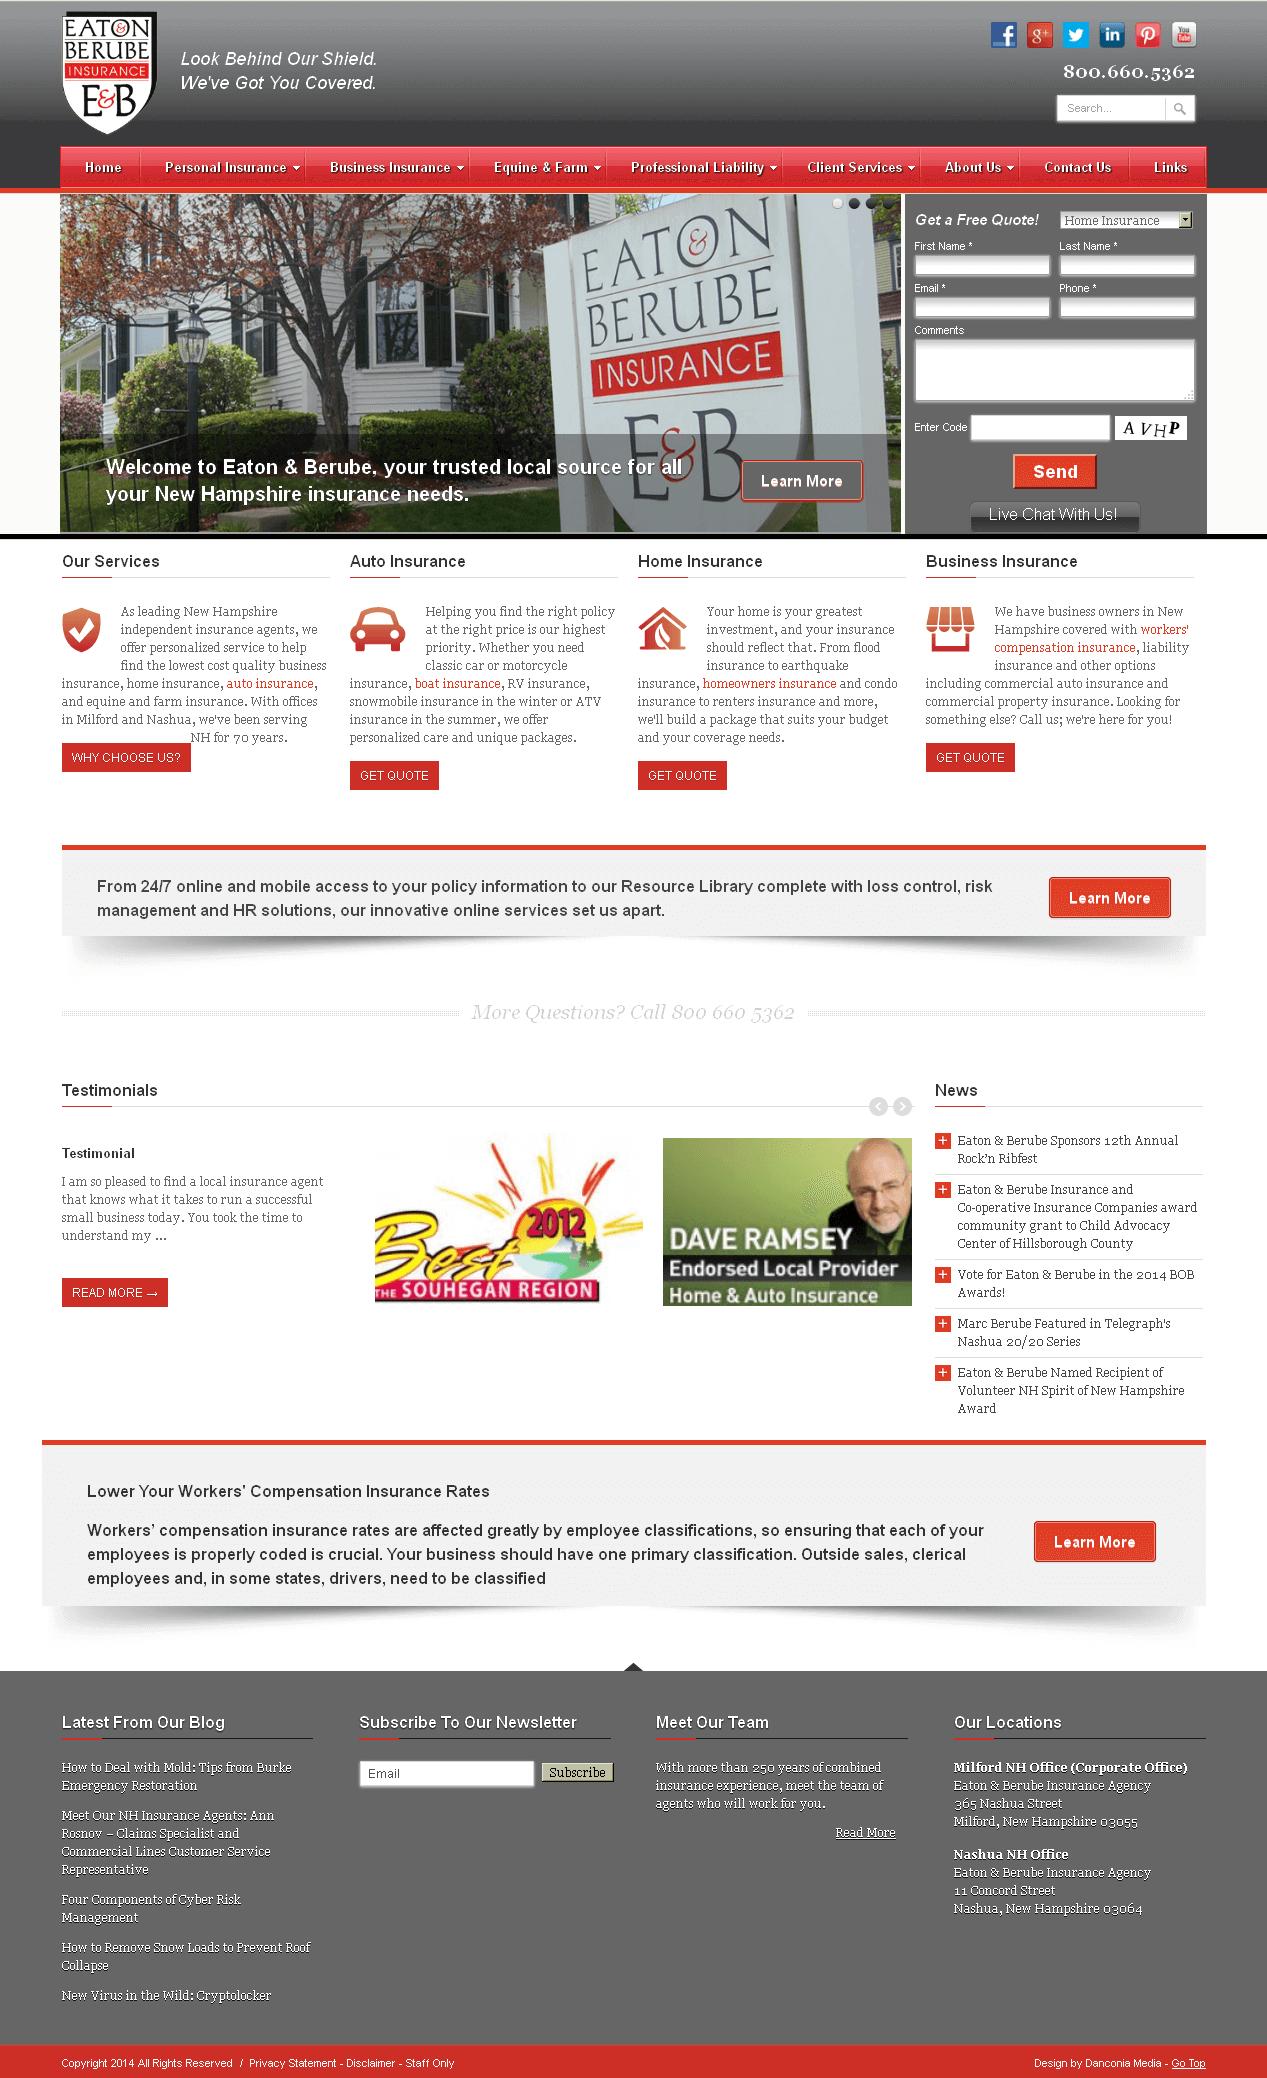 Development of WordPress Based Insurance Website - EATON & BERUBE